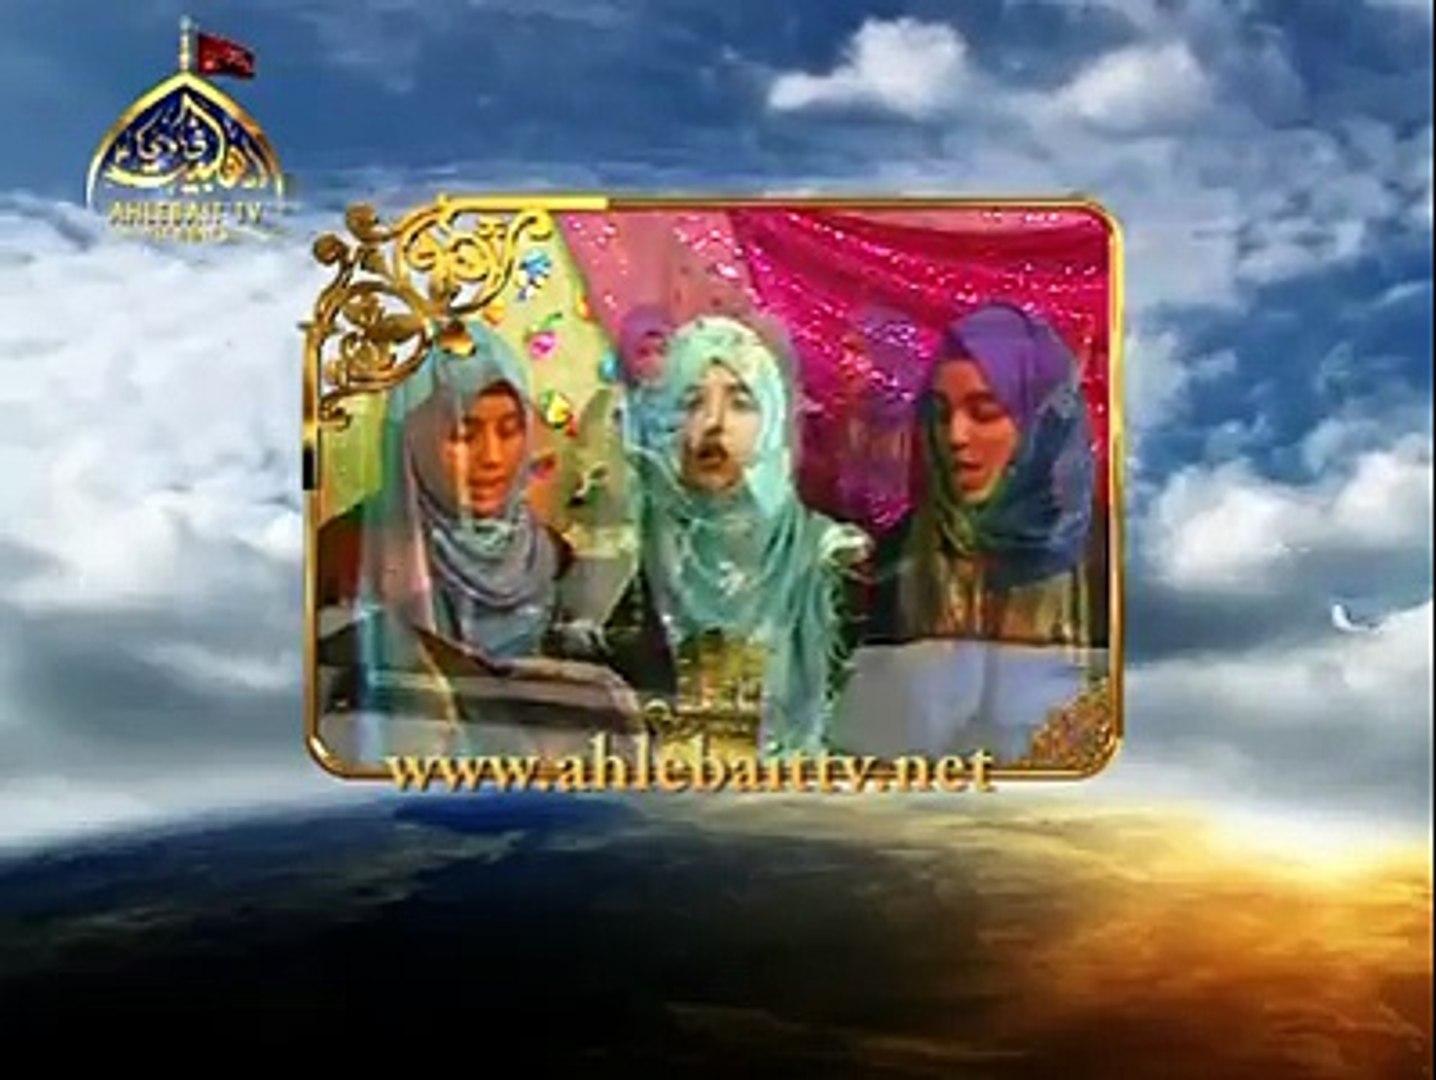 Hashim Sisters - Hussain Zindabad by Hashim Sisters 2011